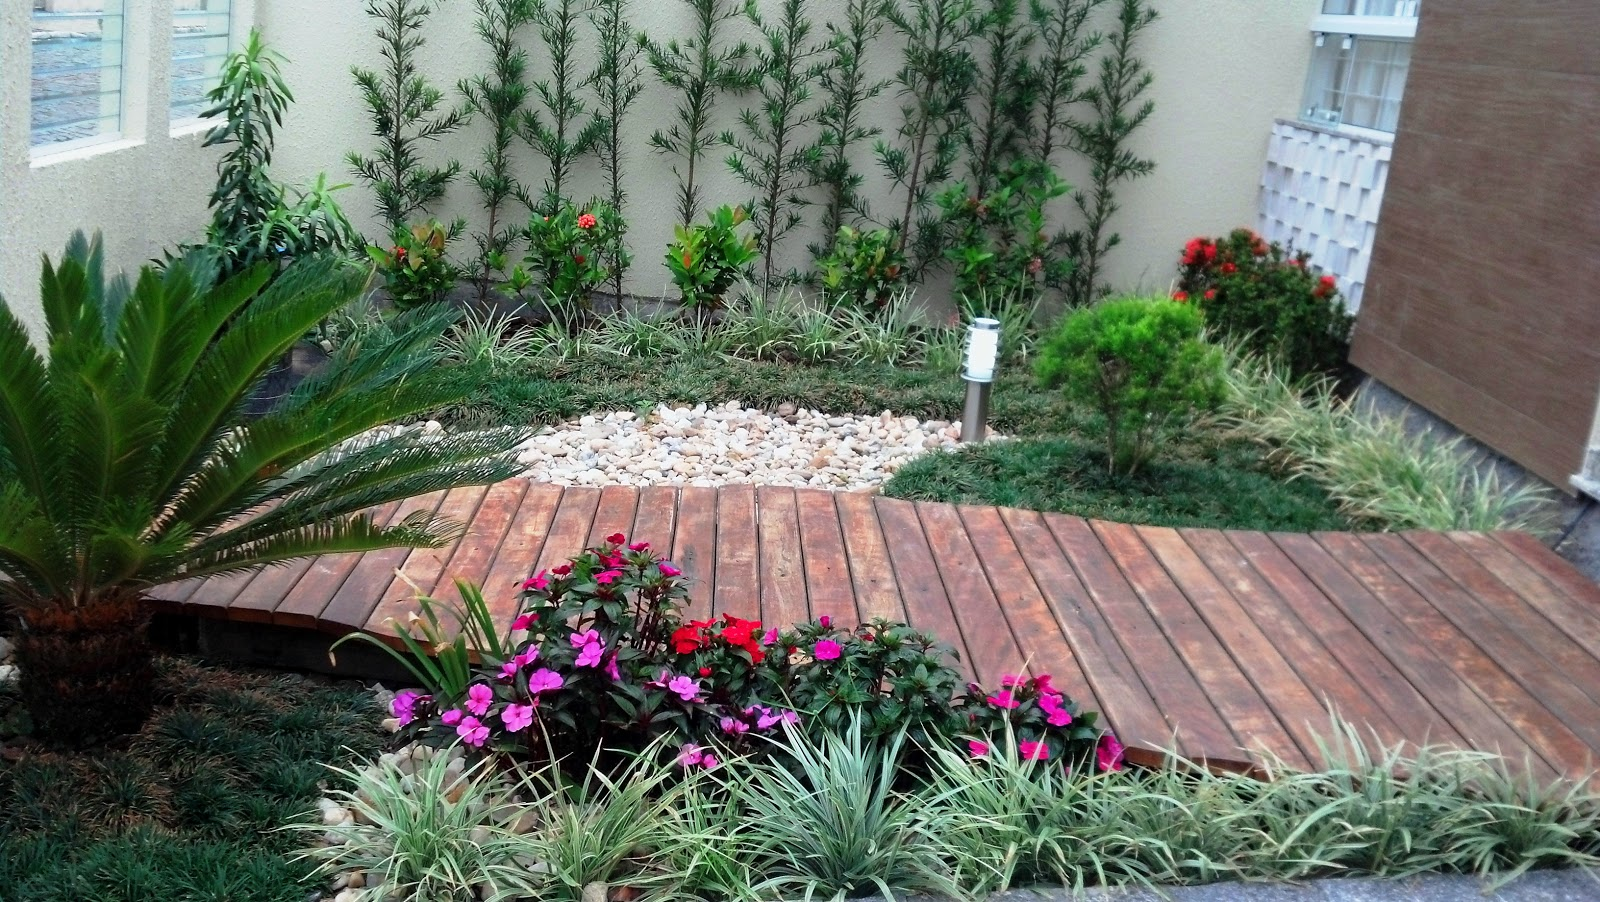 pedras jardim externo : pedras jardim externo:Exória rosa, mini exória, lirióp, mini grama preta